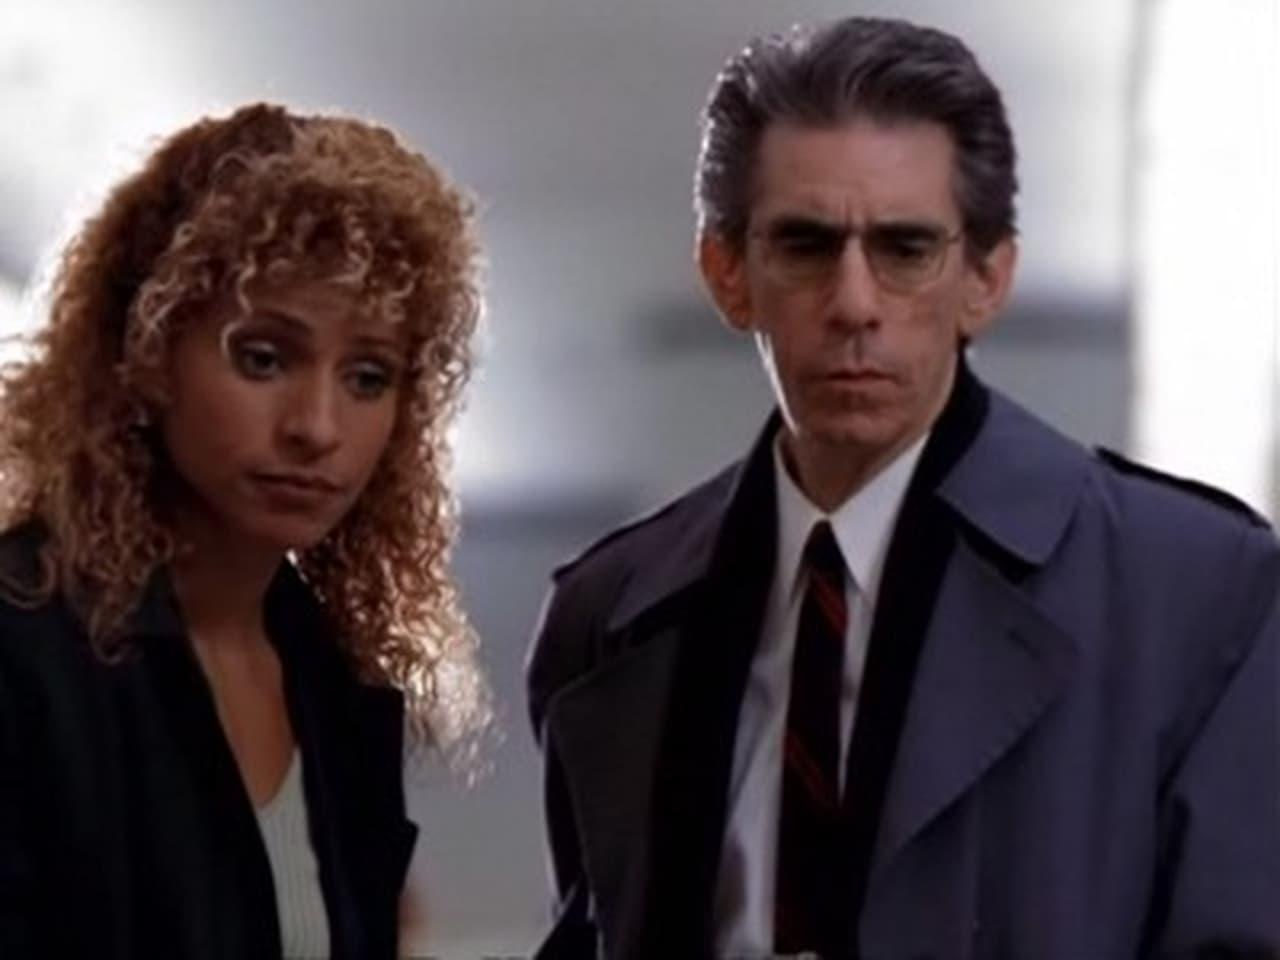 Law & Order: Special Victims Unit - Season 1 Episode 14 : Limitations